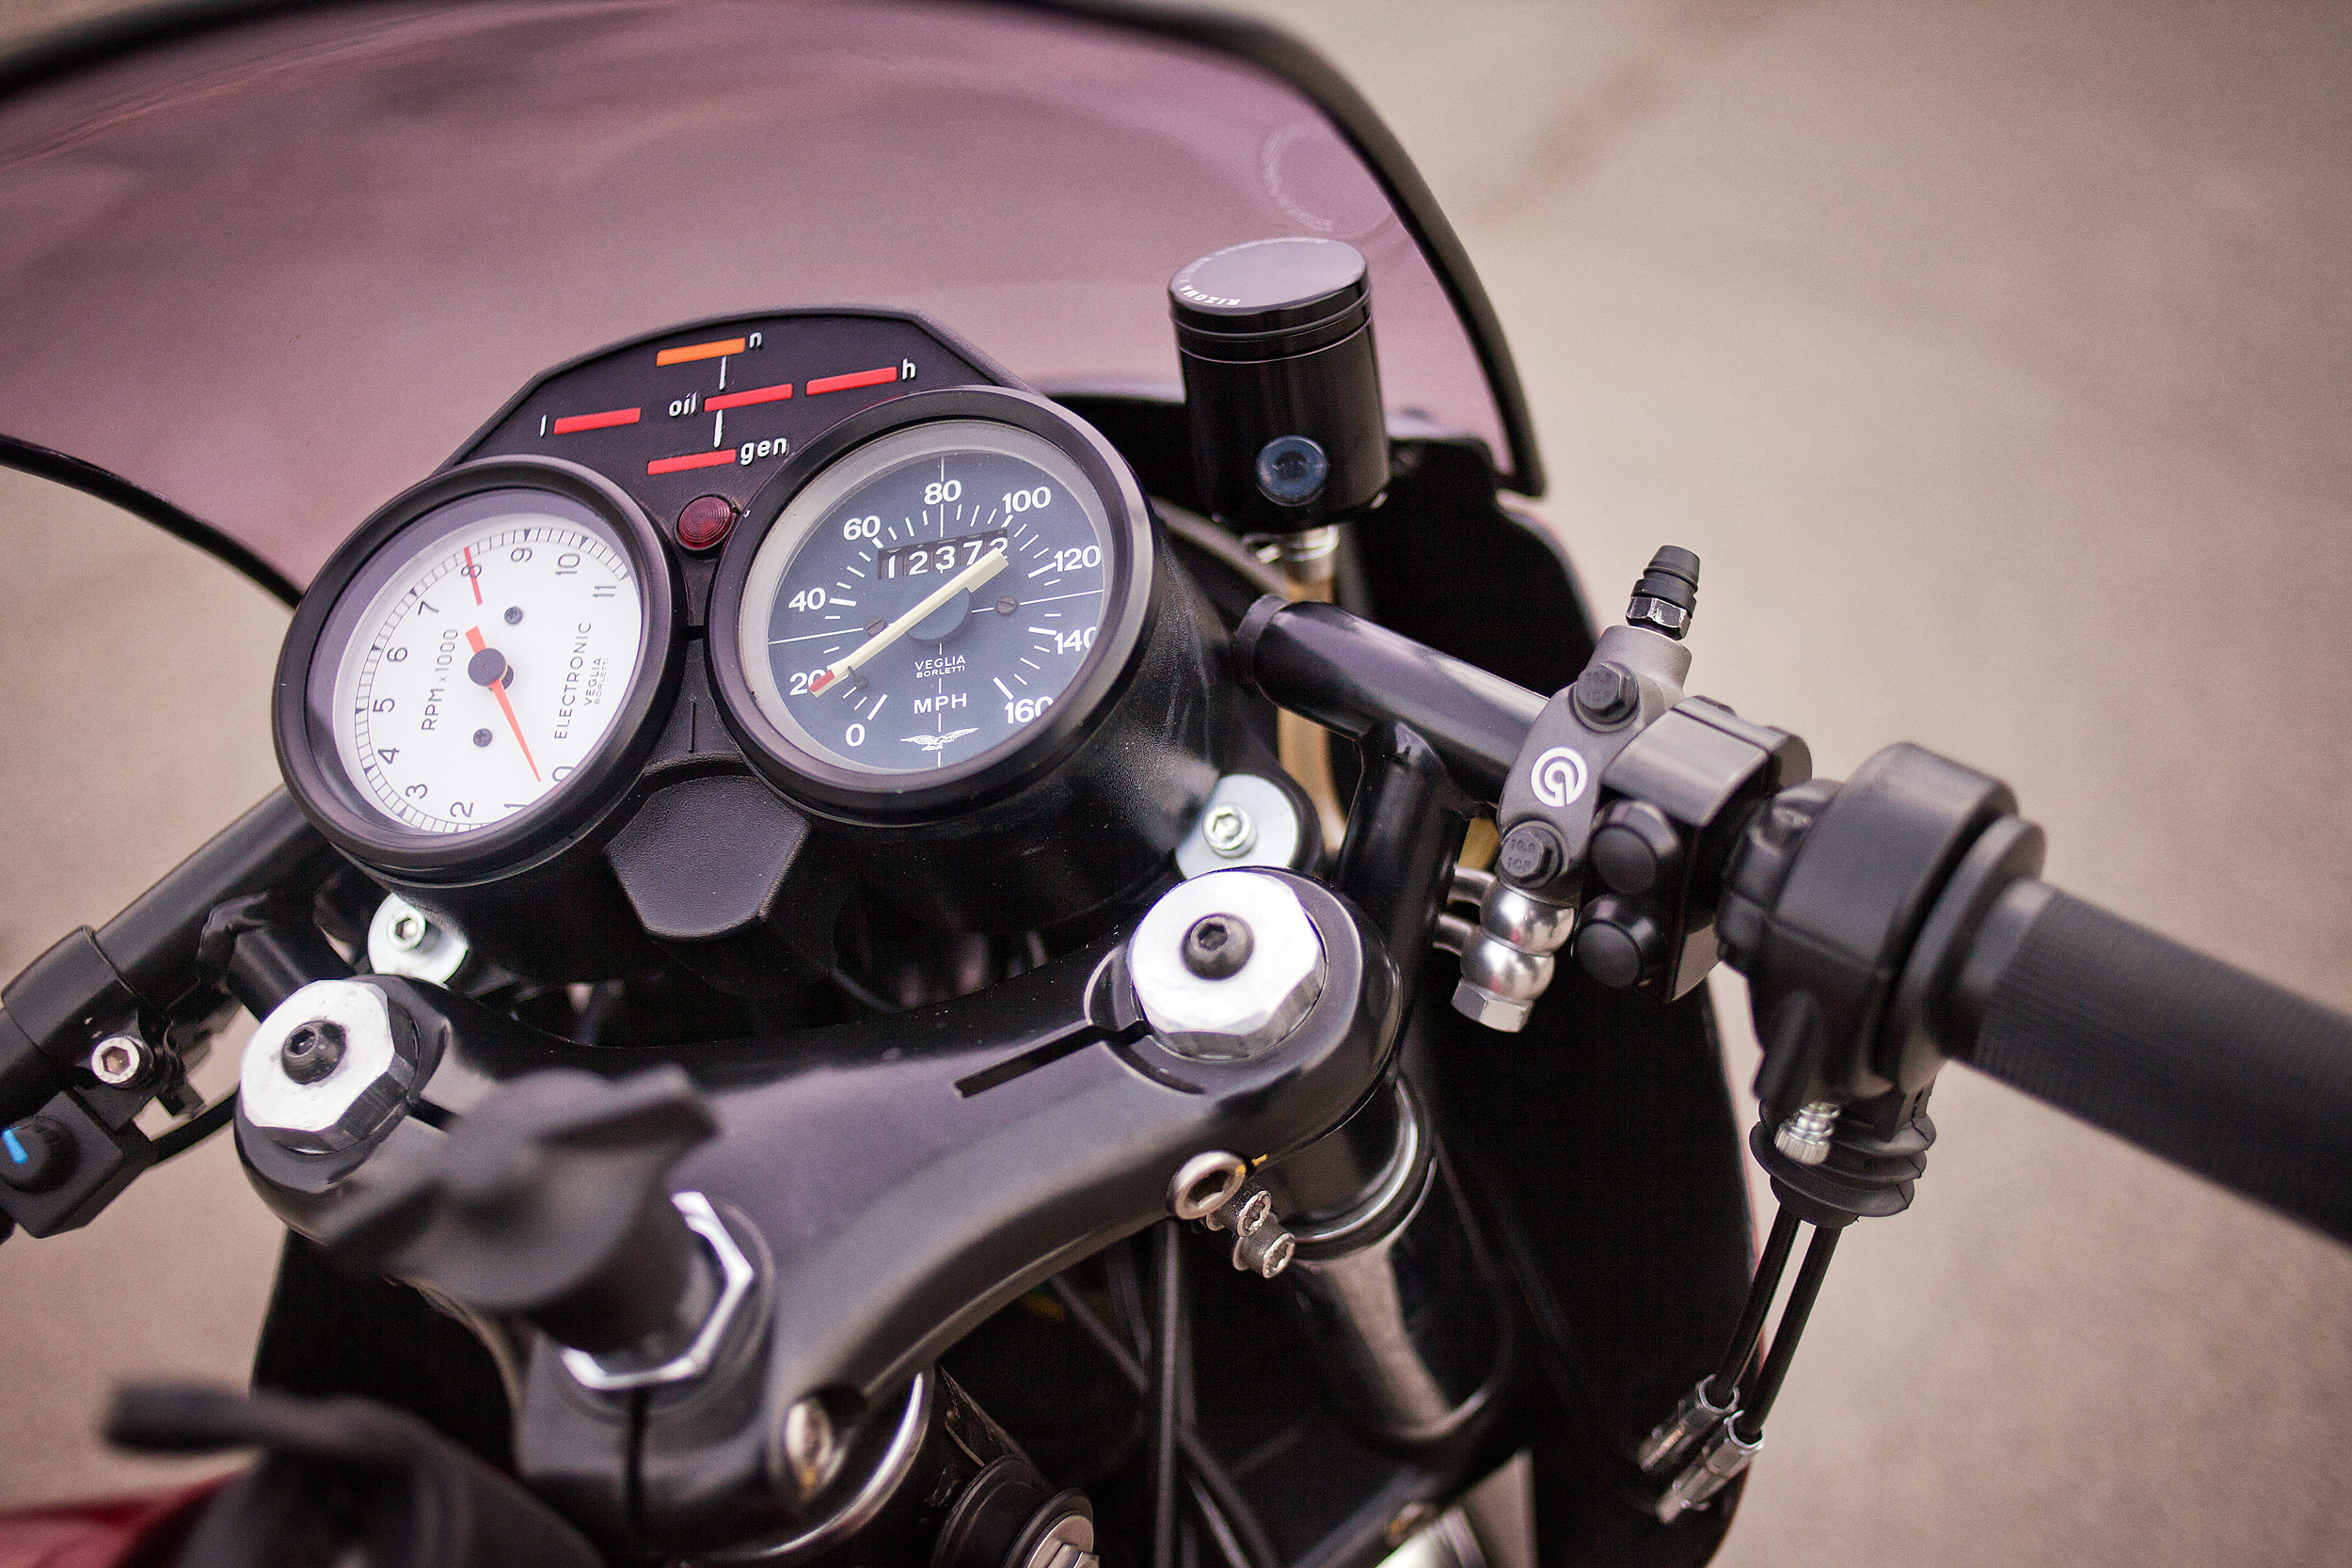 1977 Moto Guzzi lemans 1 custom gauges